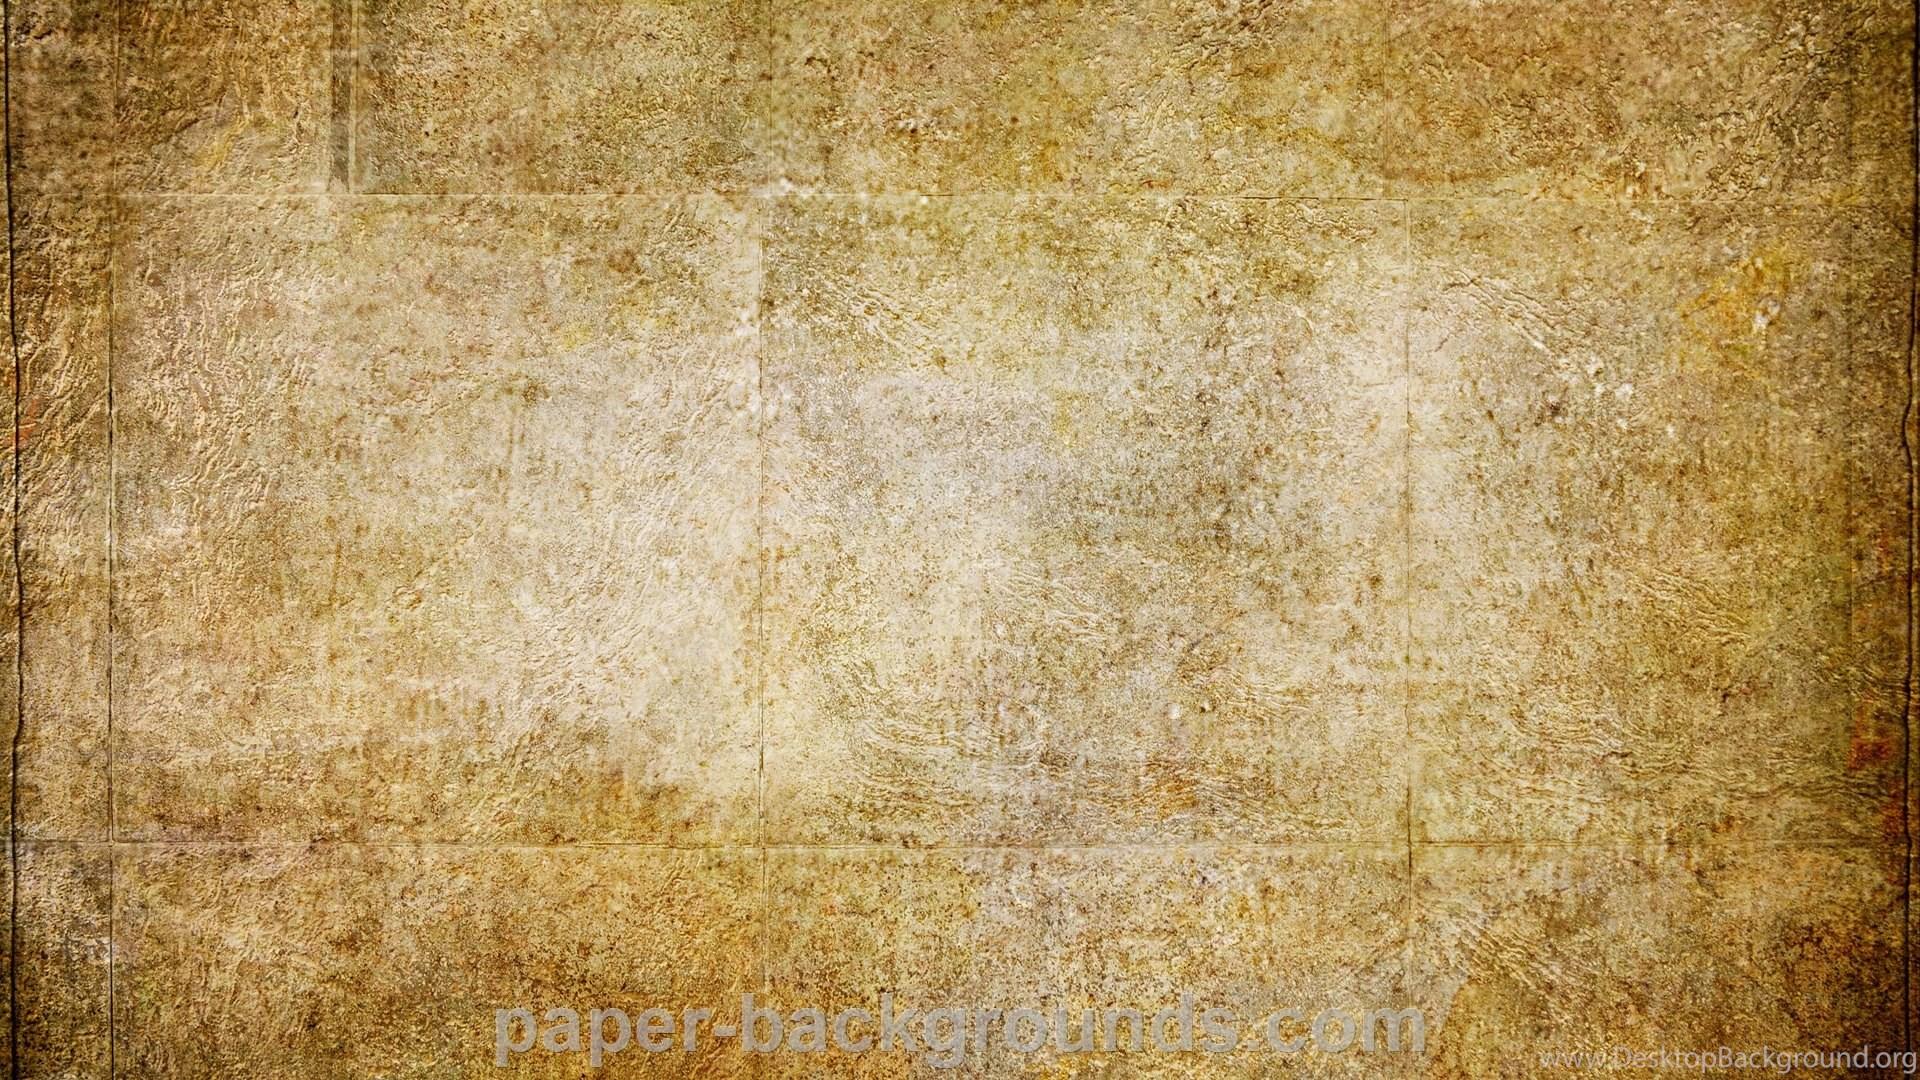 Grunge Backgrounds Texture Free Large Images Desktop Background